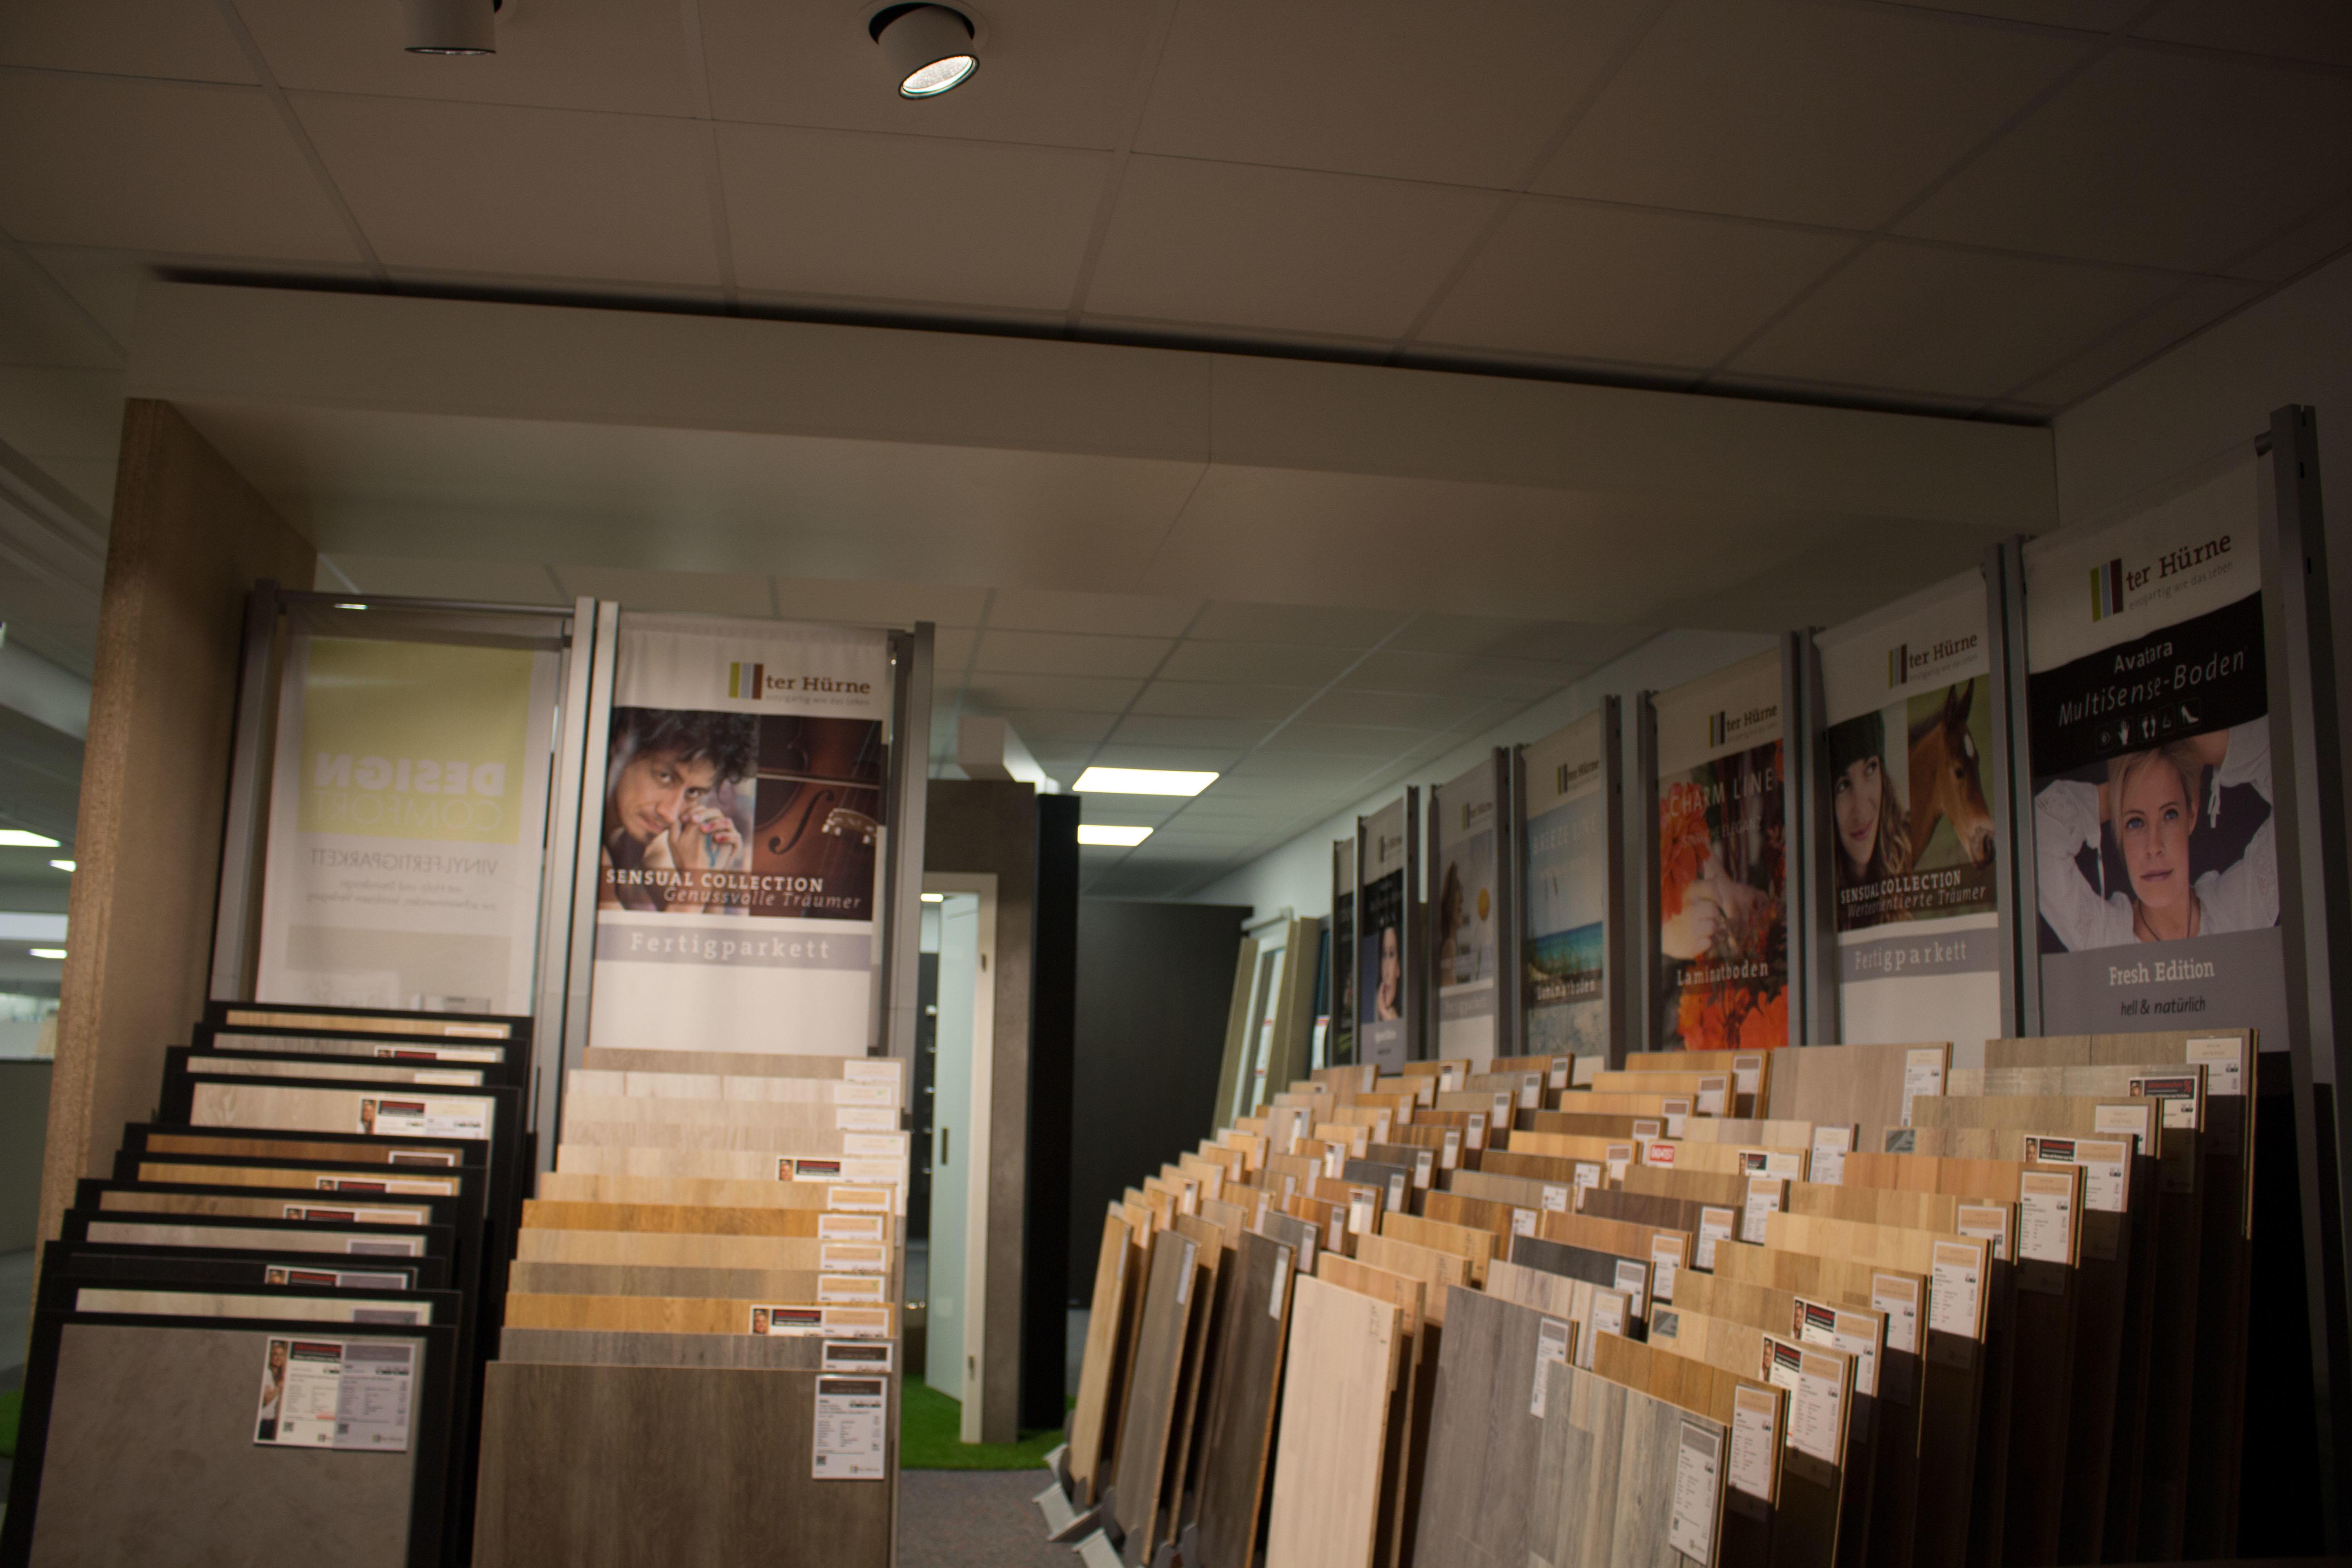 bauen leben gmbh co kg baumarkt in d sseldorf am kleinforst 5. Black Bedroom Furniture Sets. Home Design Ideas